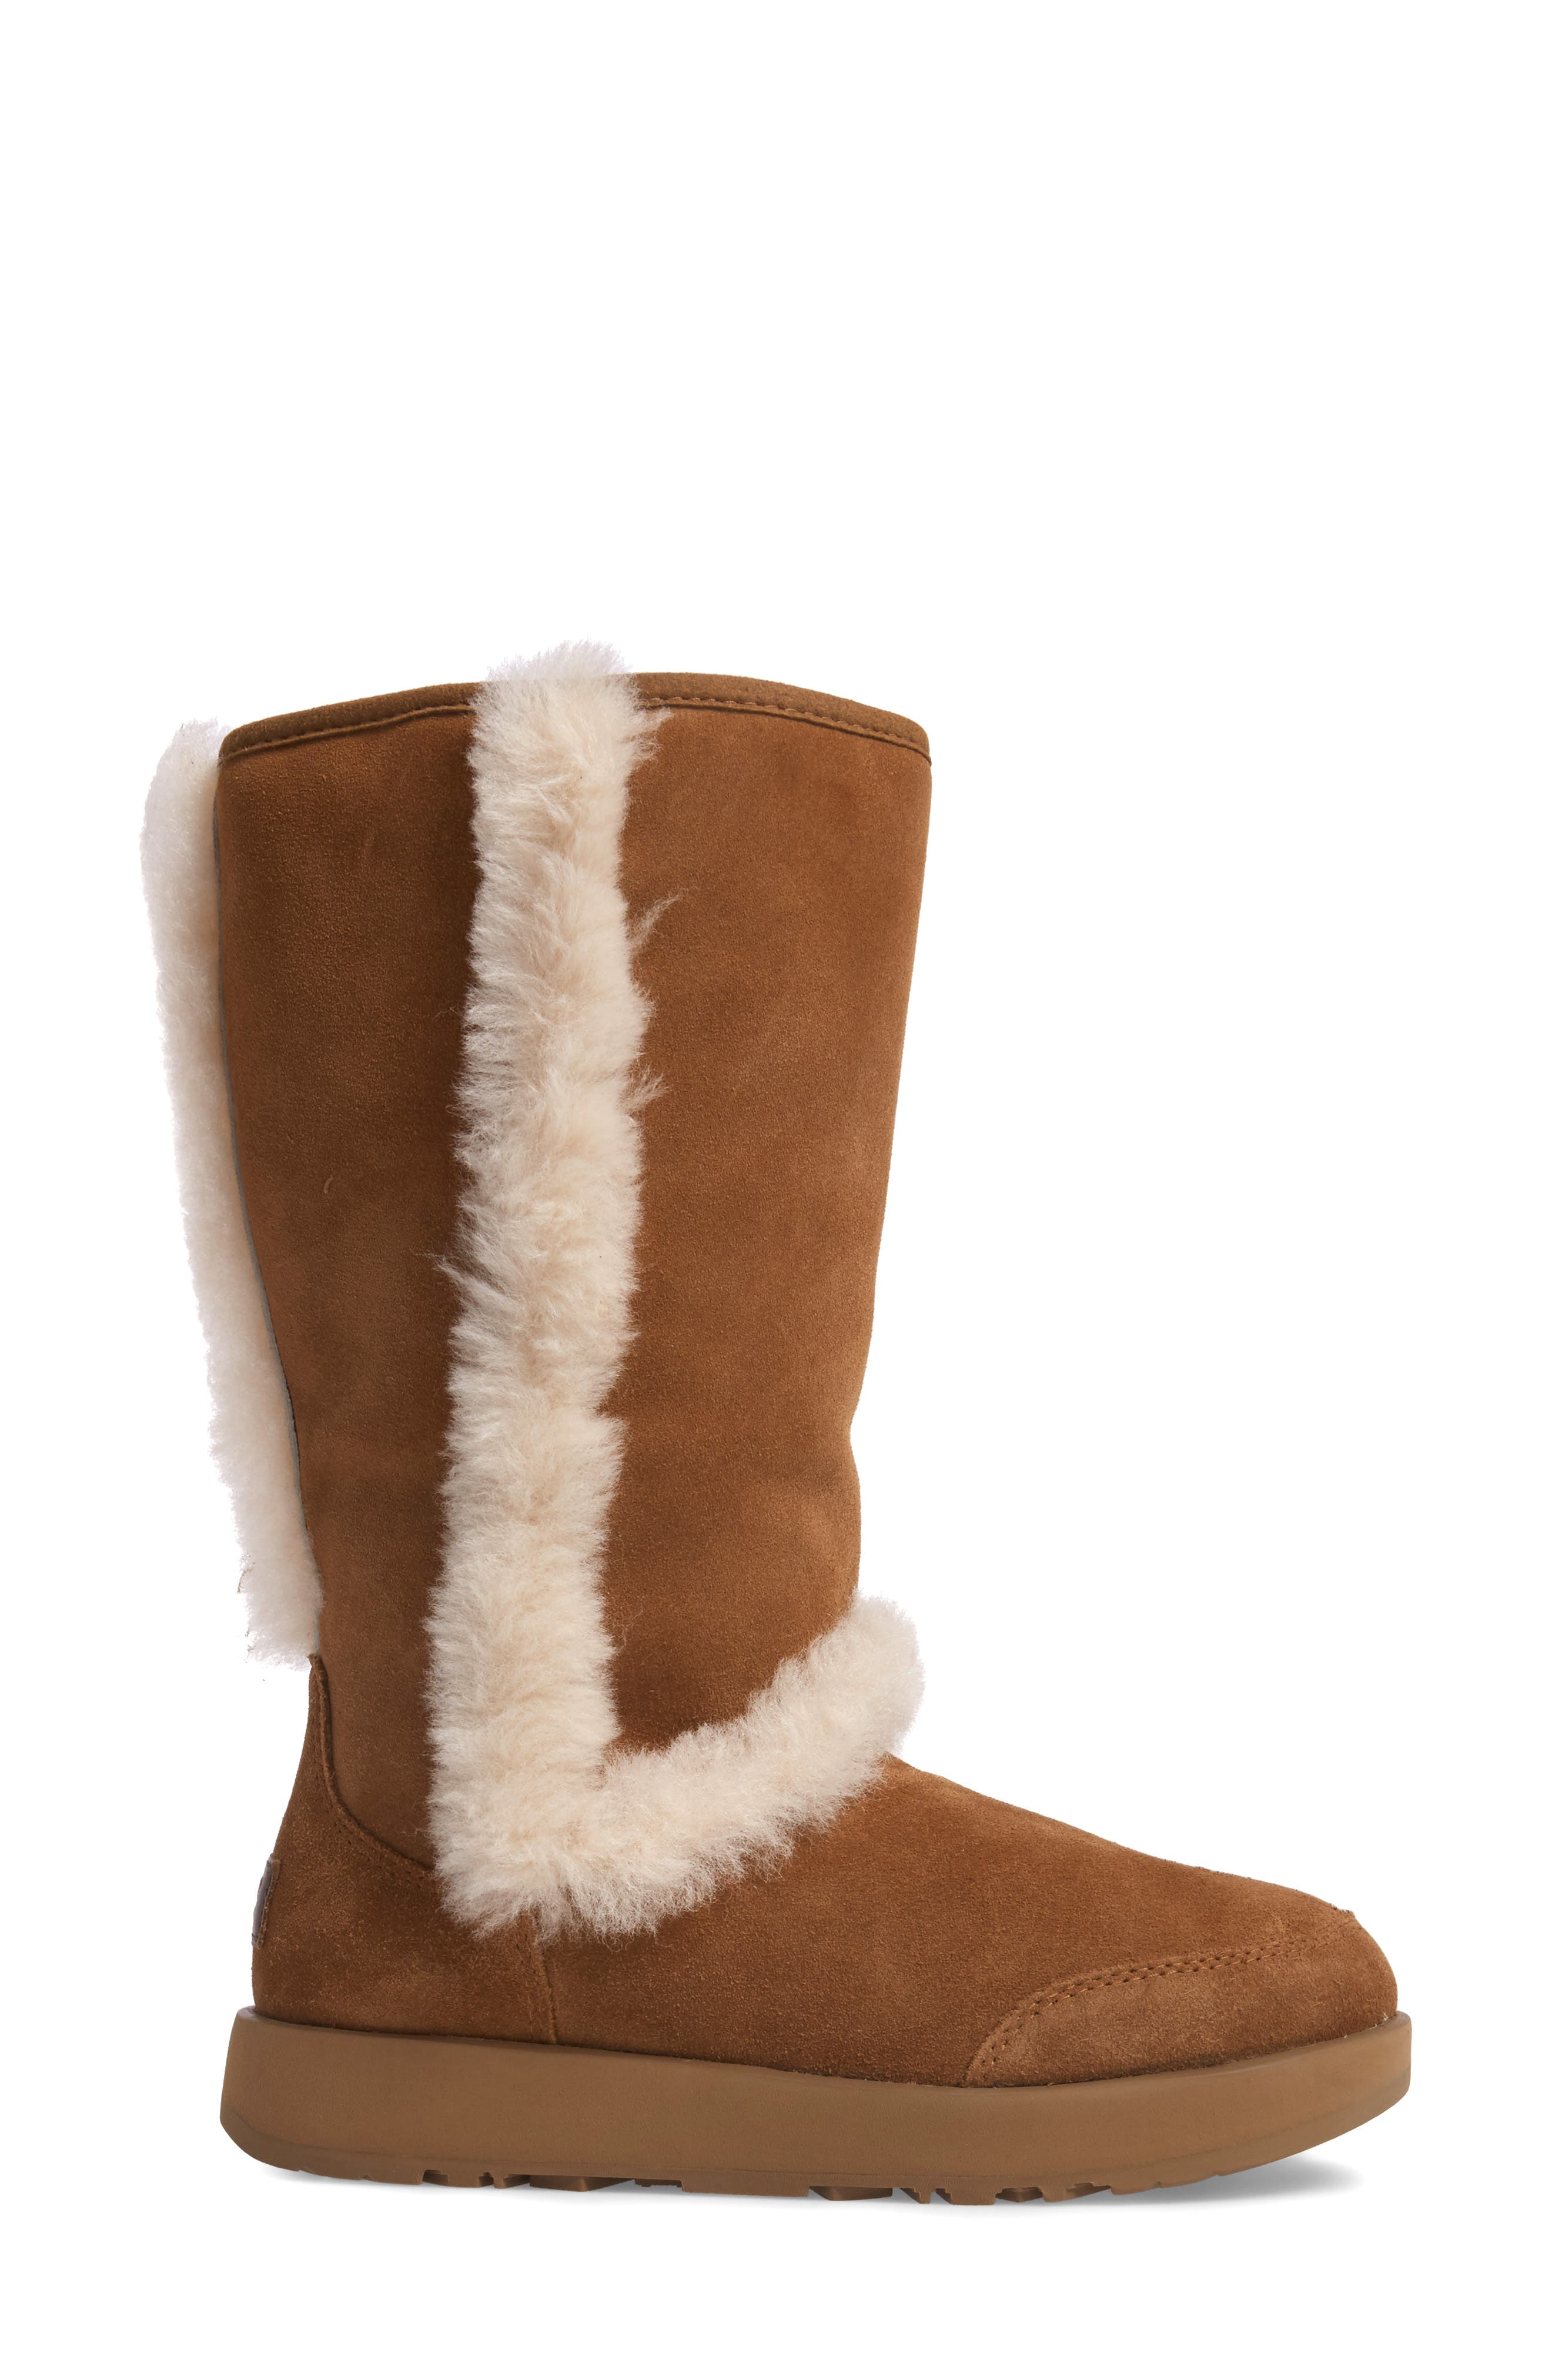 Alternate Image 3  - UGG® Sundance Genuine Shearling Waterproof Boot (Women)